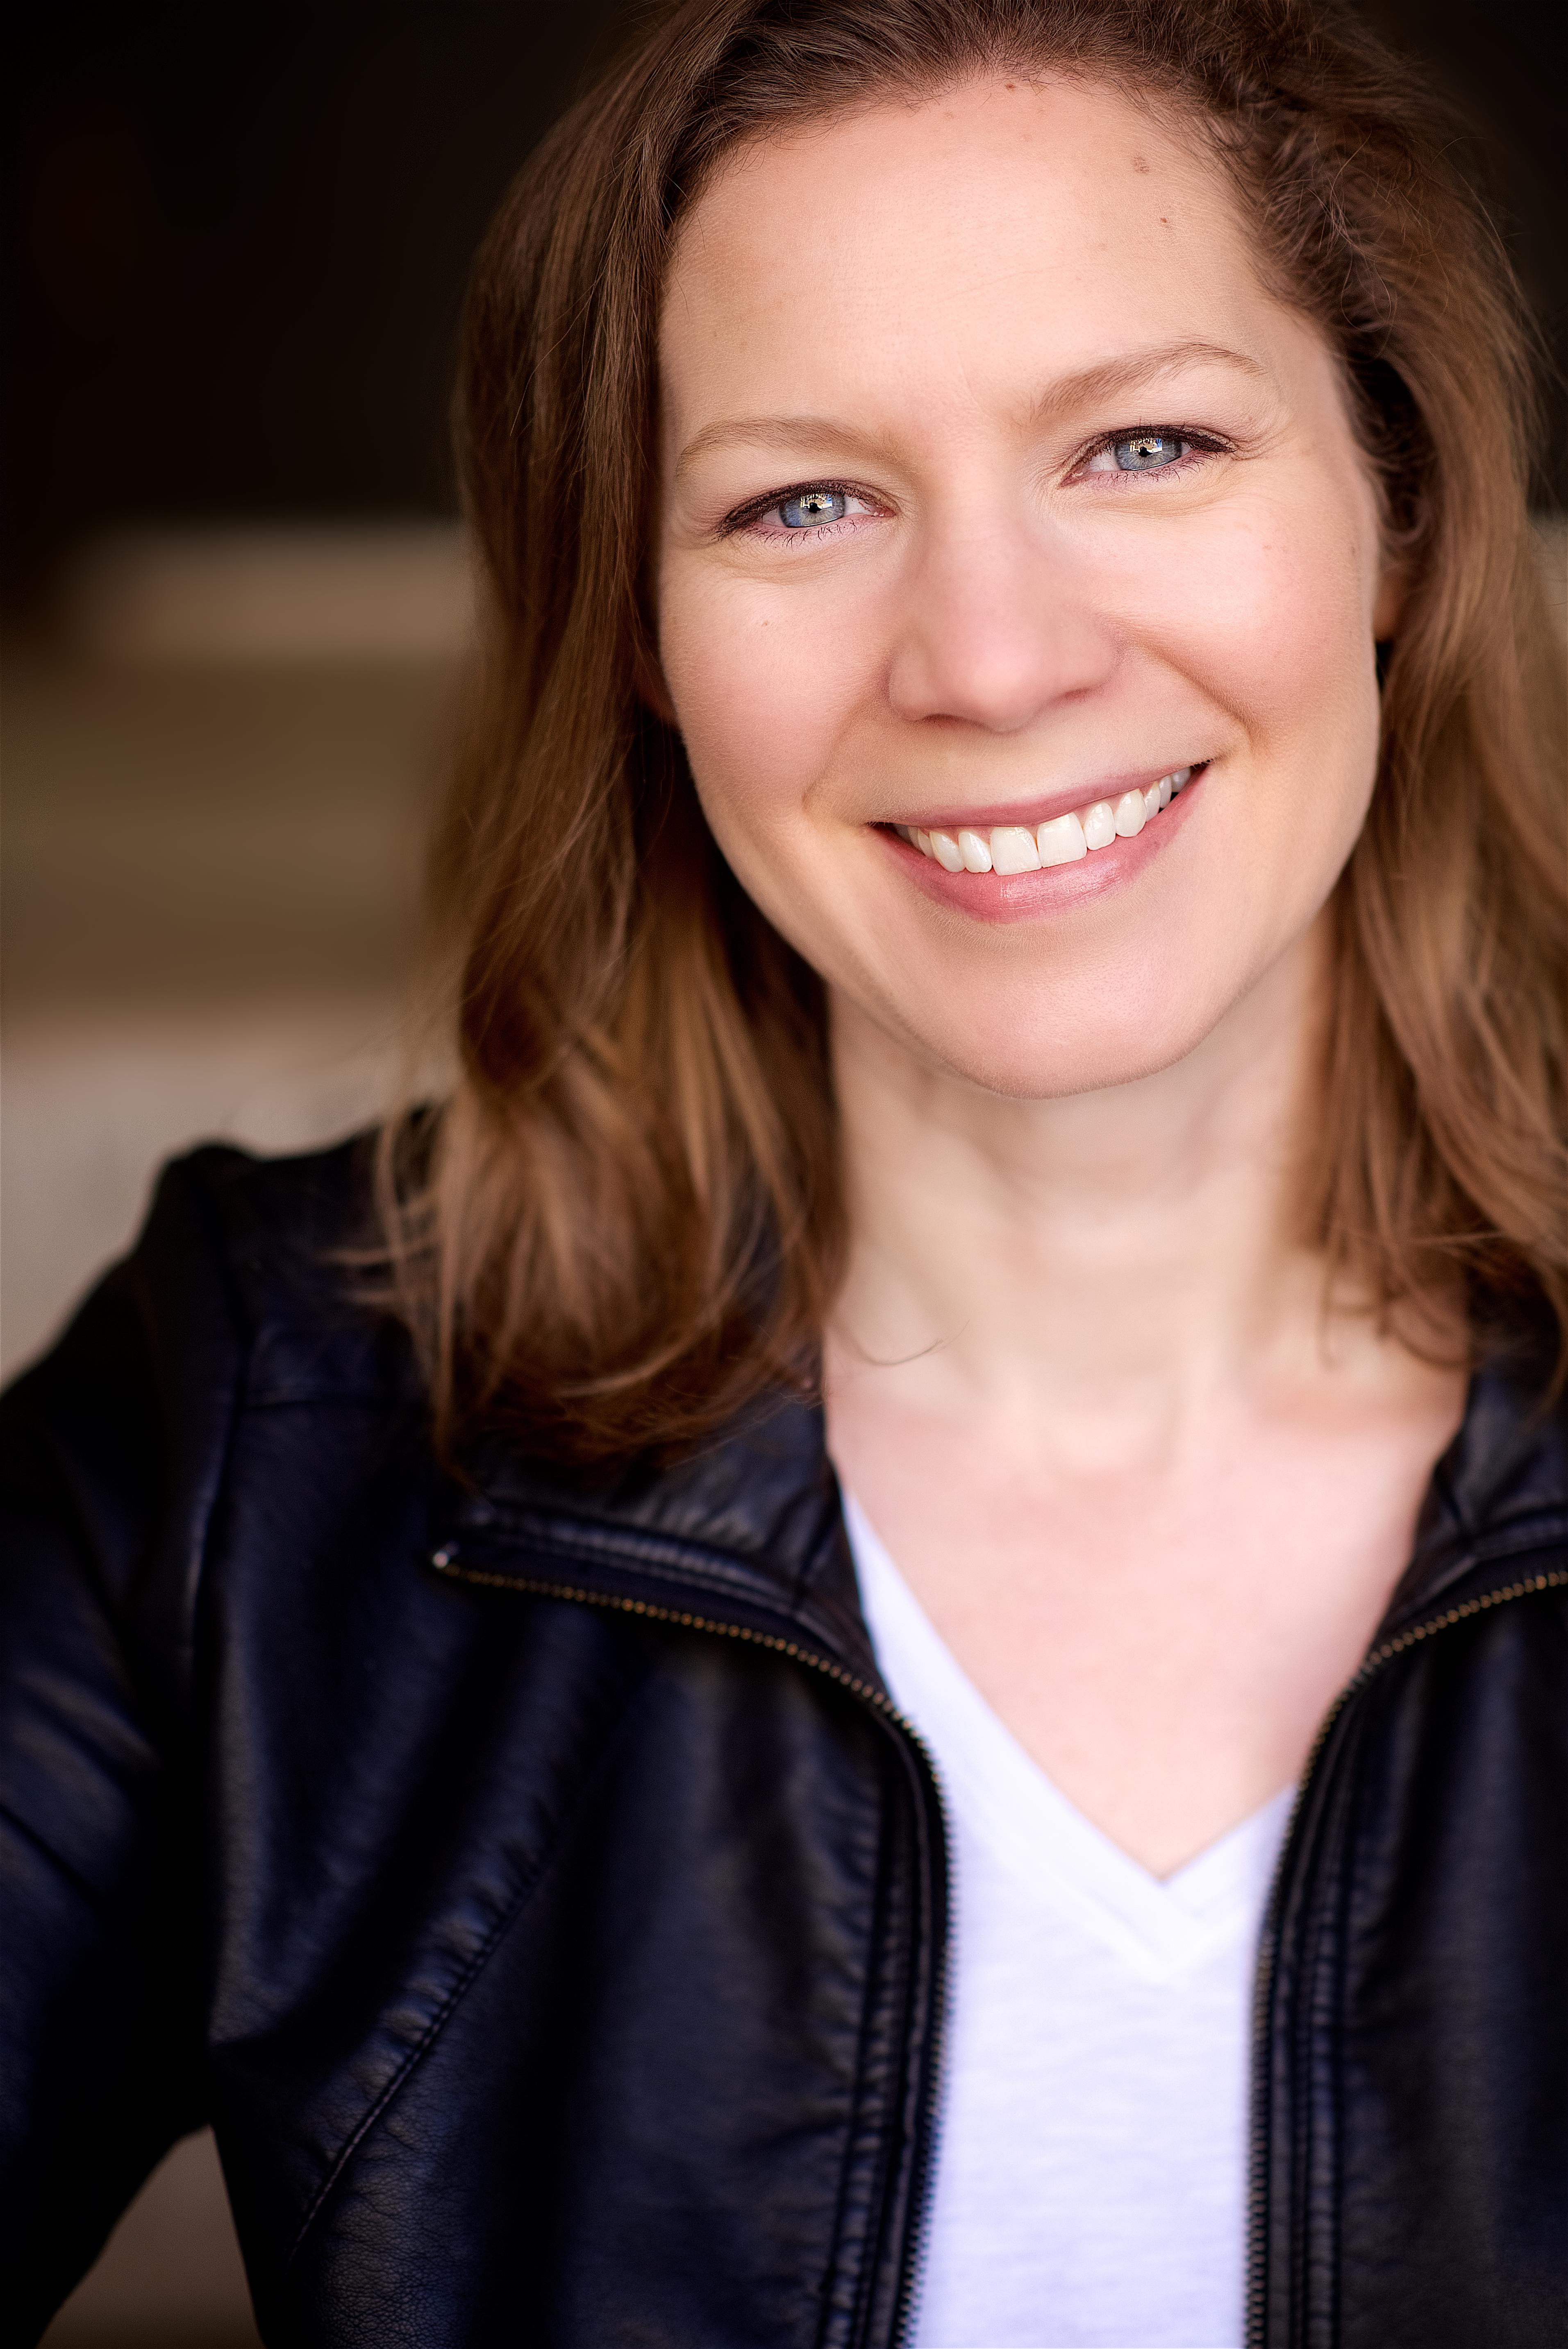 Kristina Riegle Headshot 2018